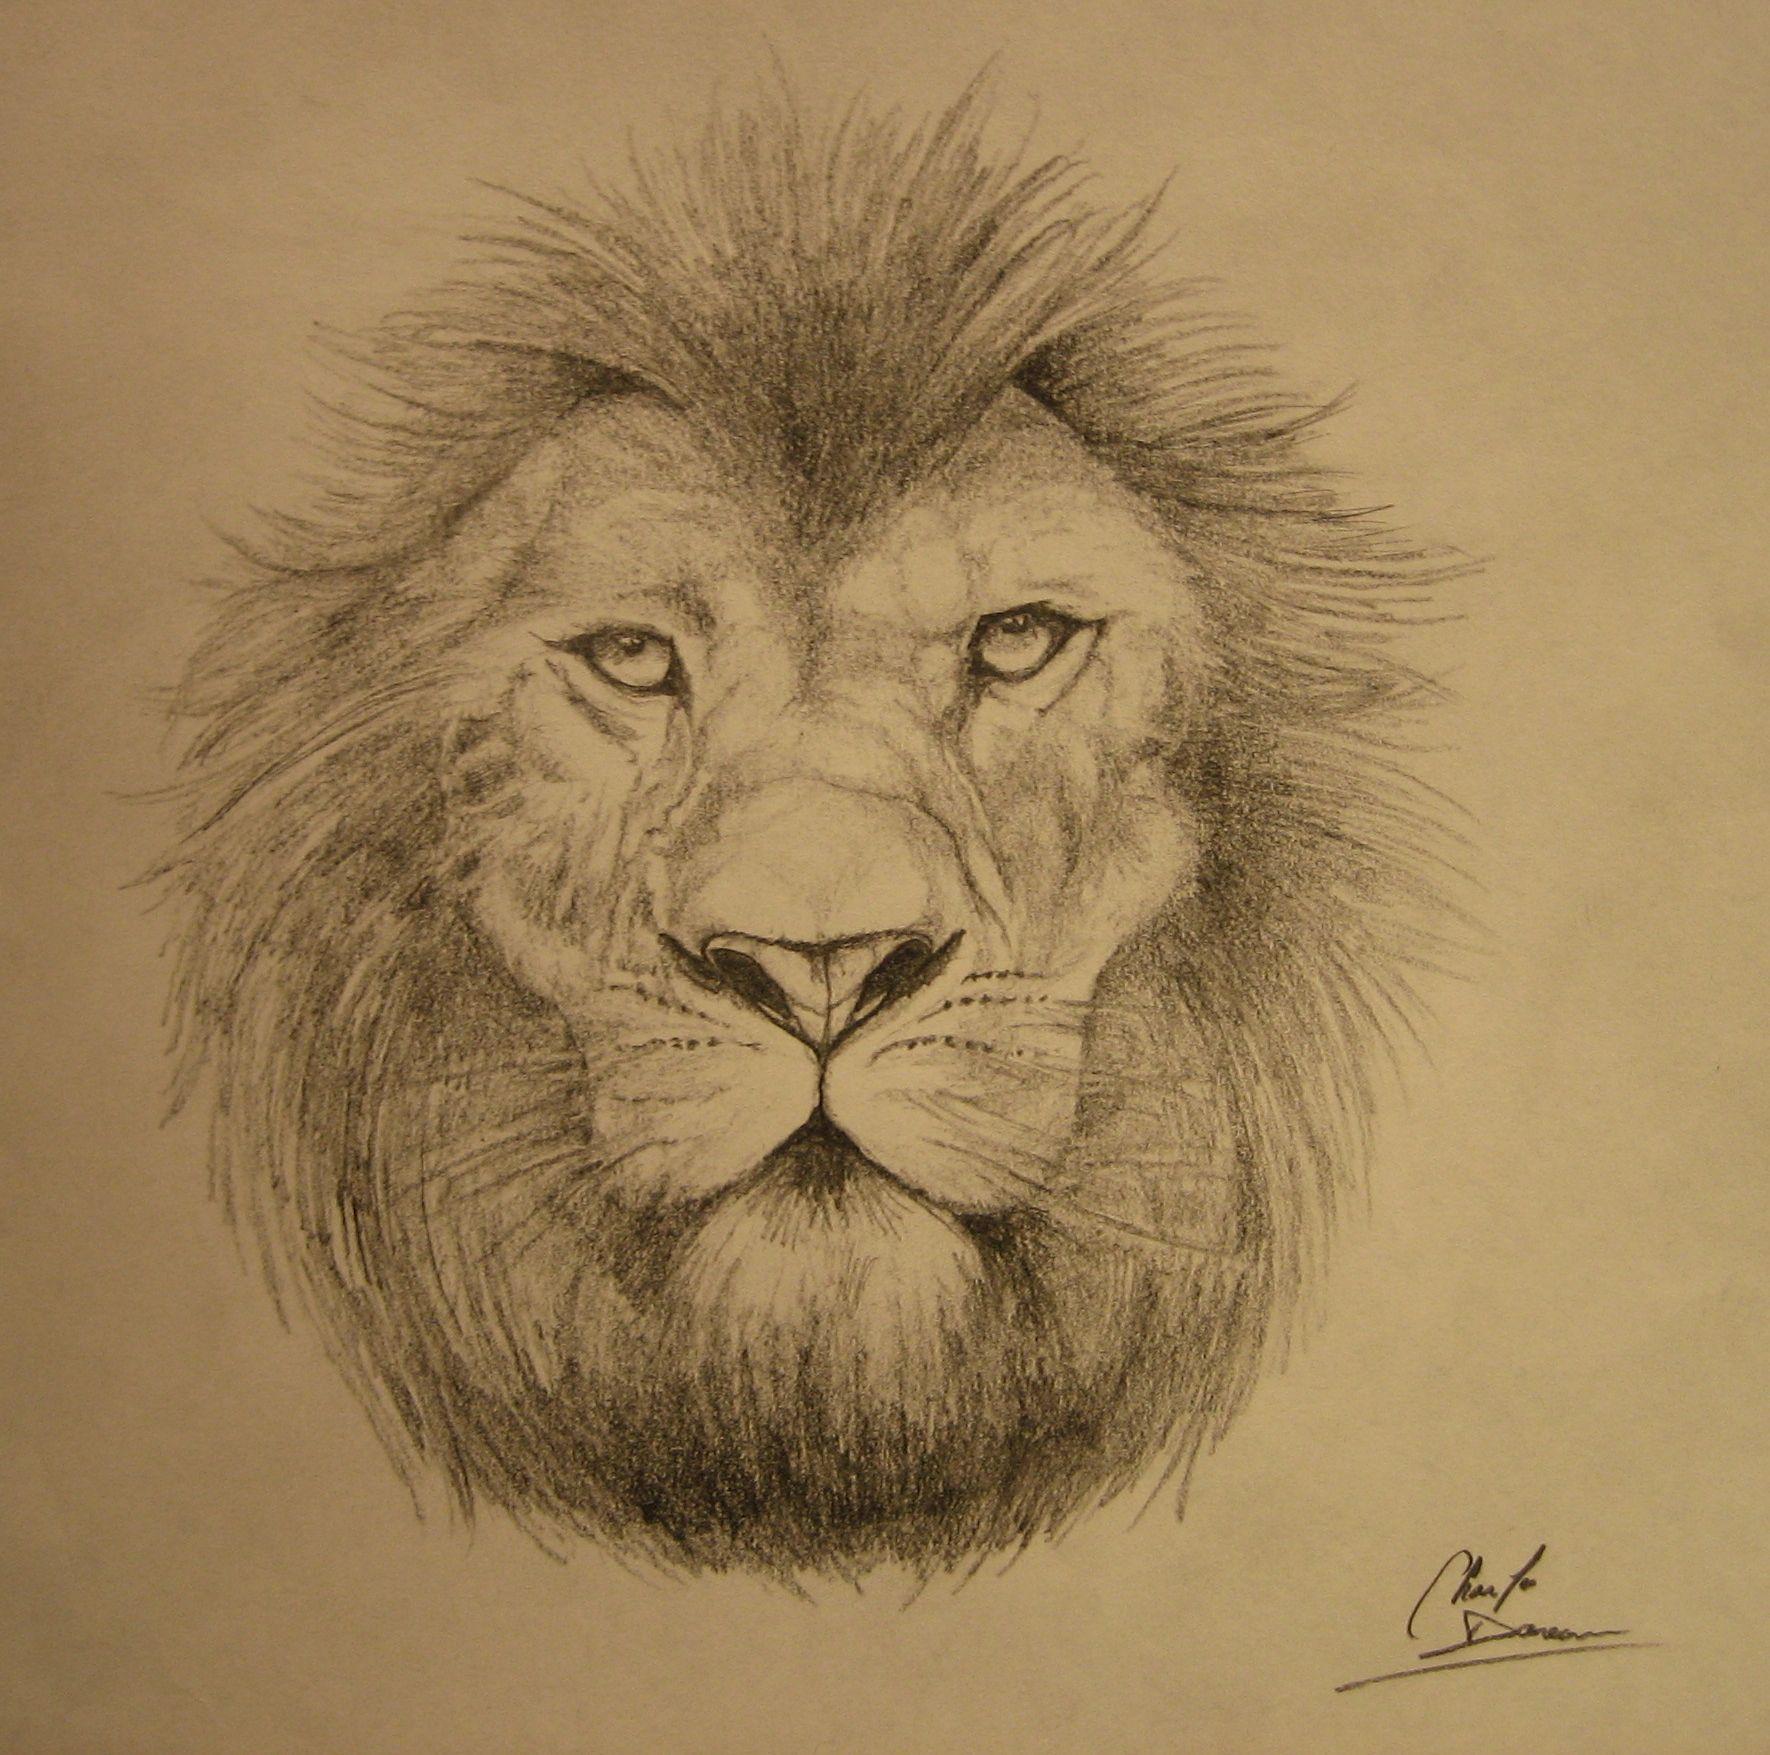 Lion_by_cdan777